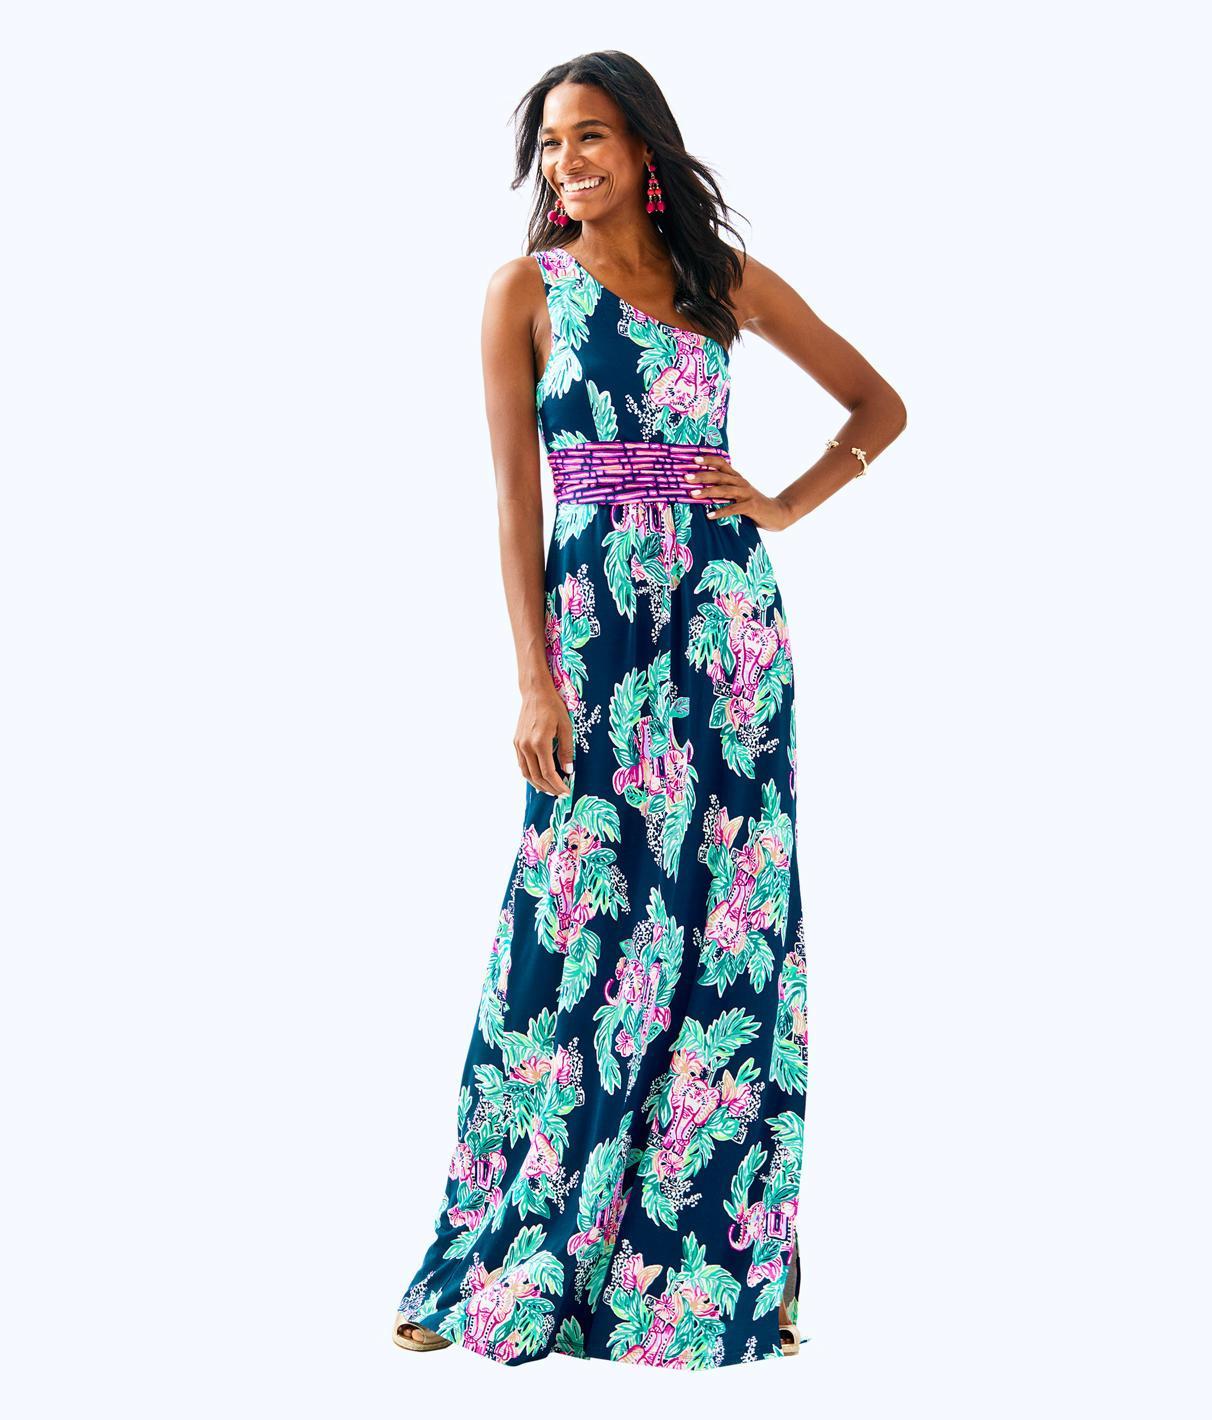 fa9dc6b2868125 Lilly Pulitzer Malia Maxi Dress In Inky Navy Peanut Gallery Engineered Maxi  Dress